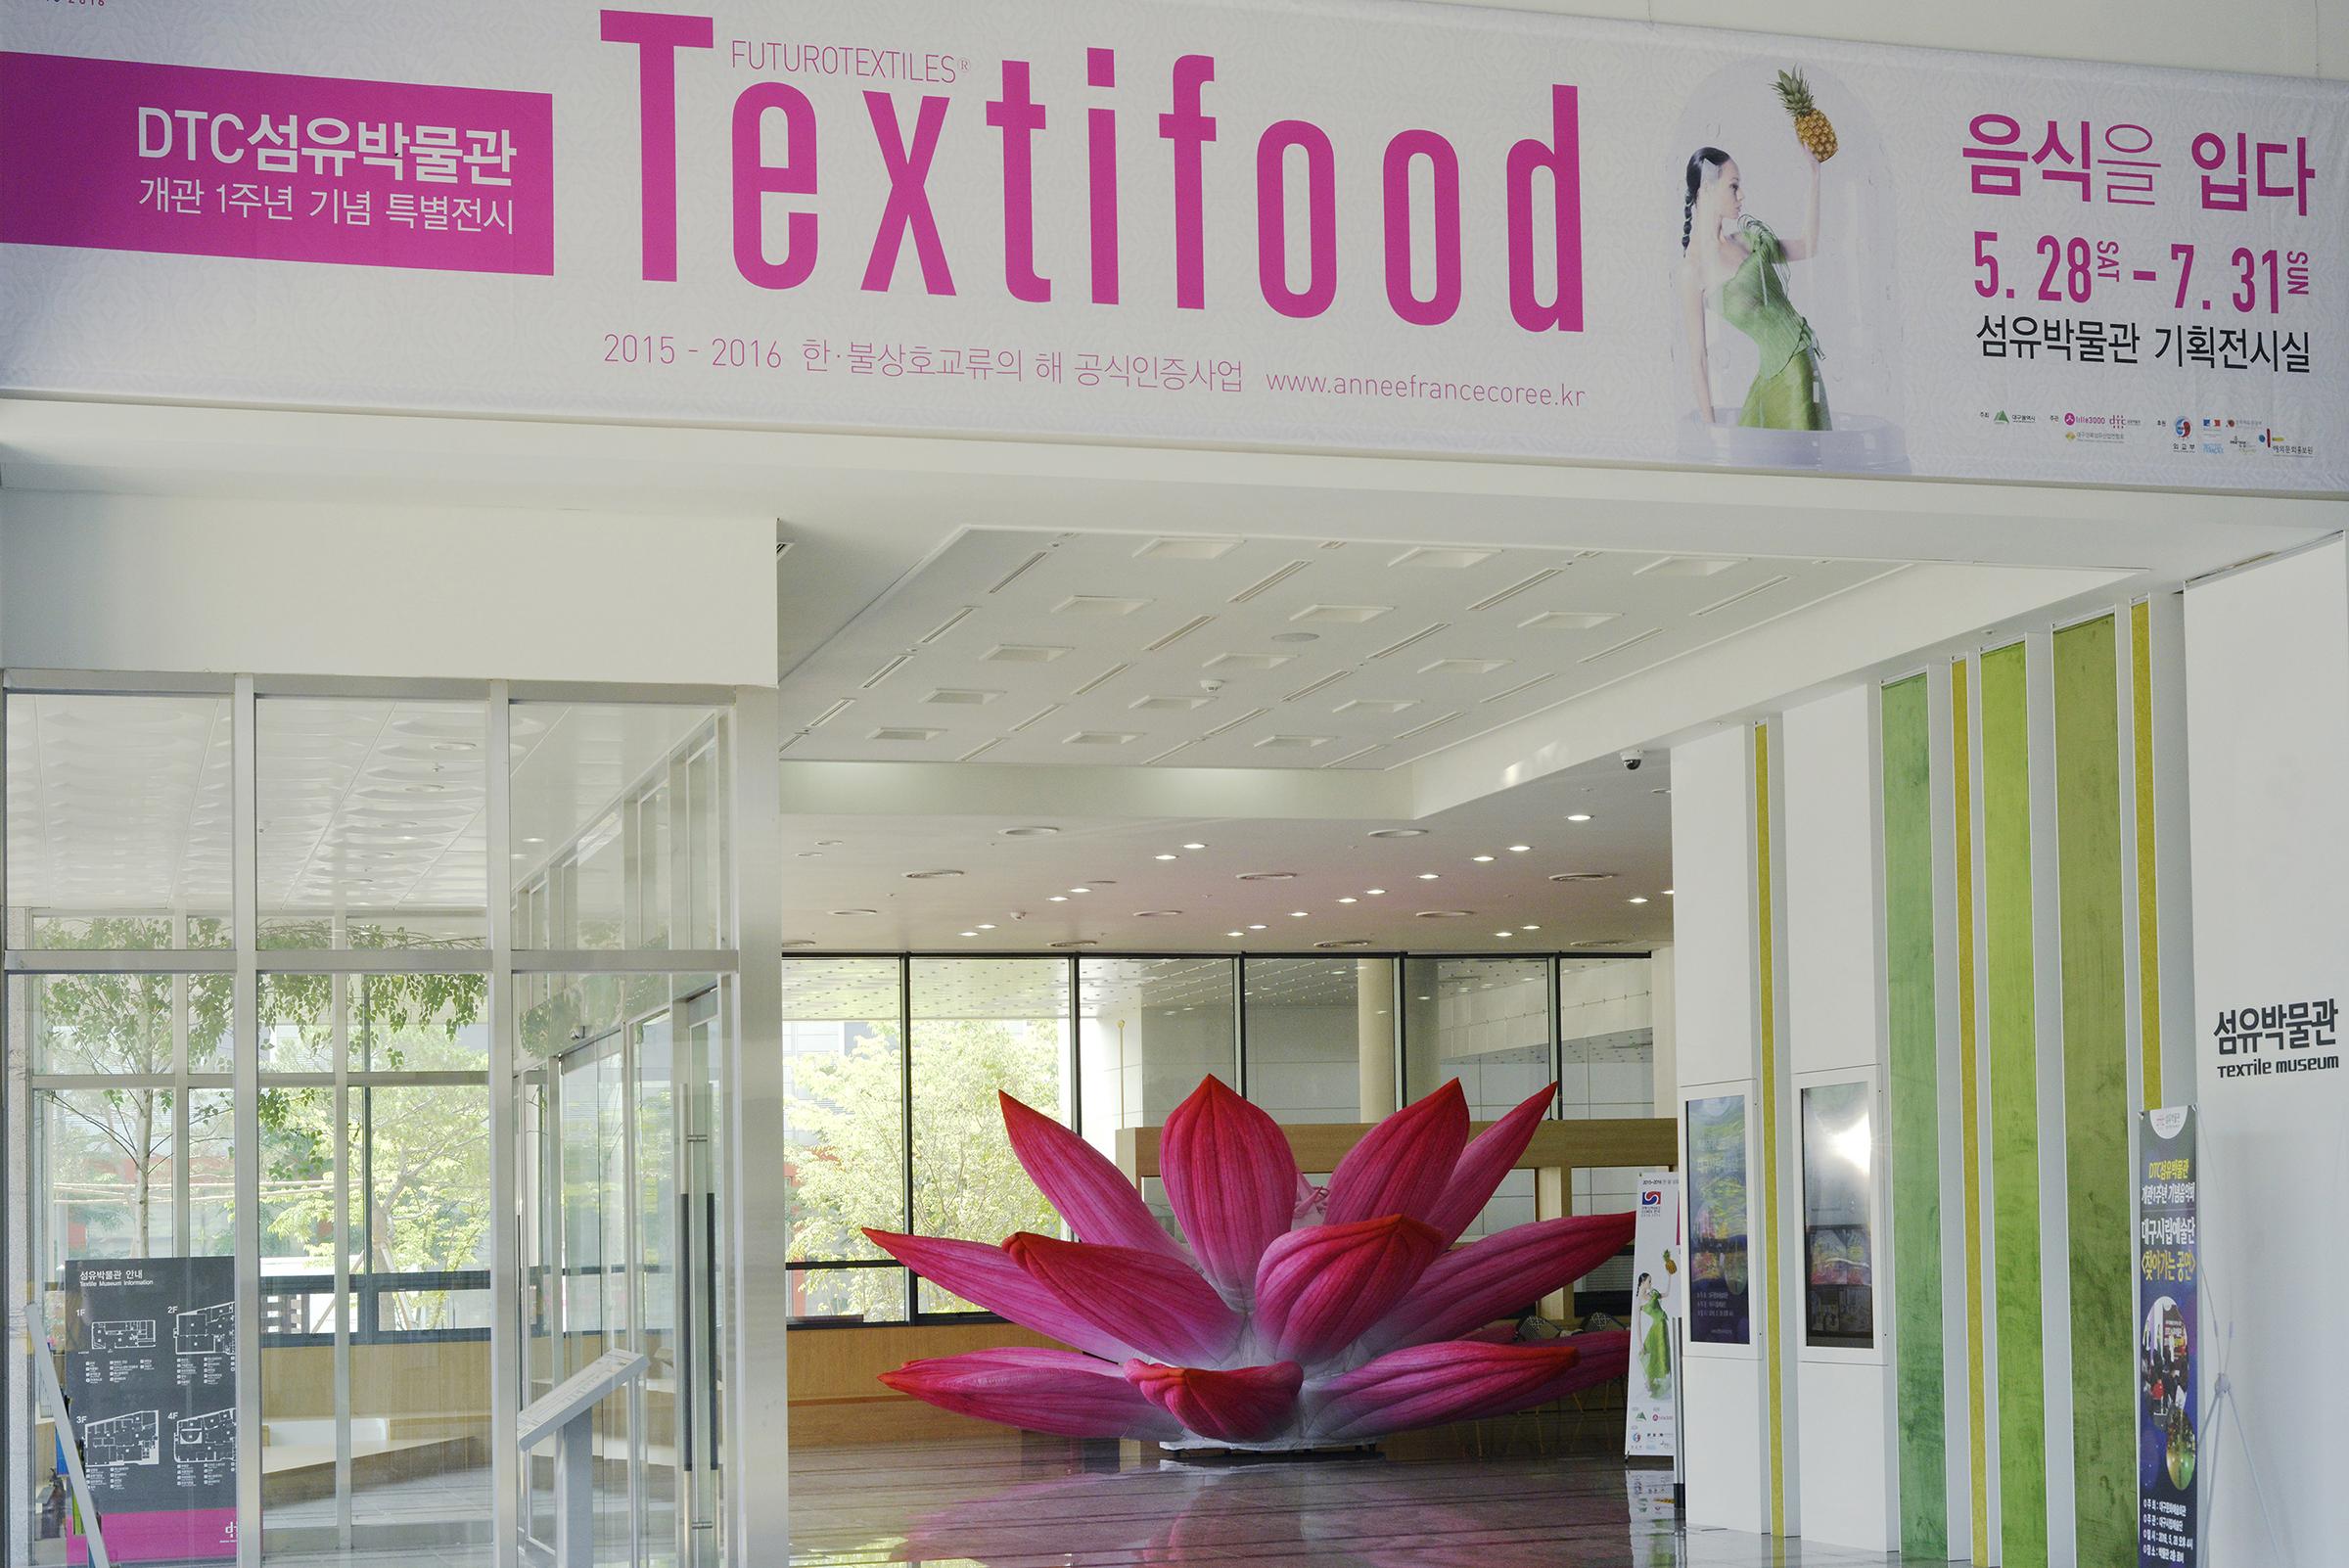 TextifoodDaegu©lille3000-LeilaPereira02.JPG